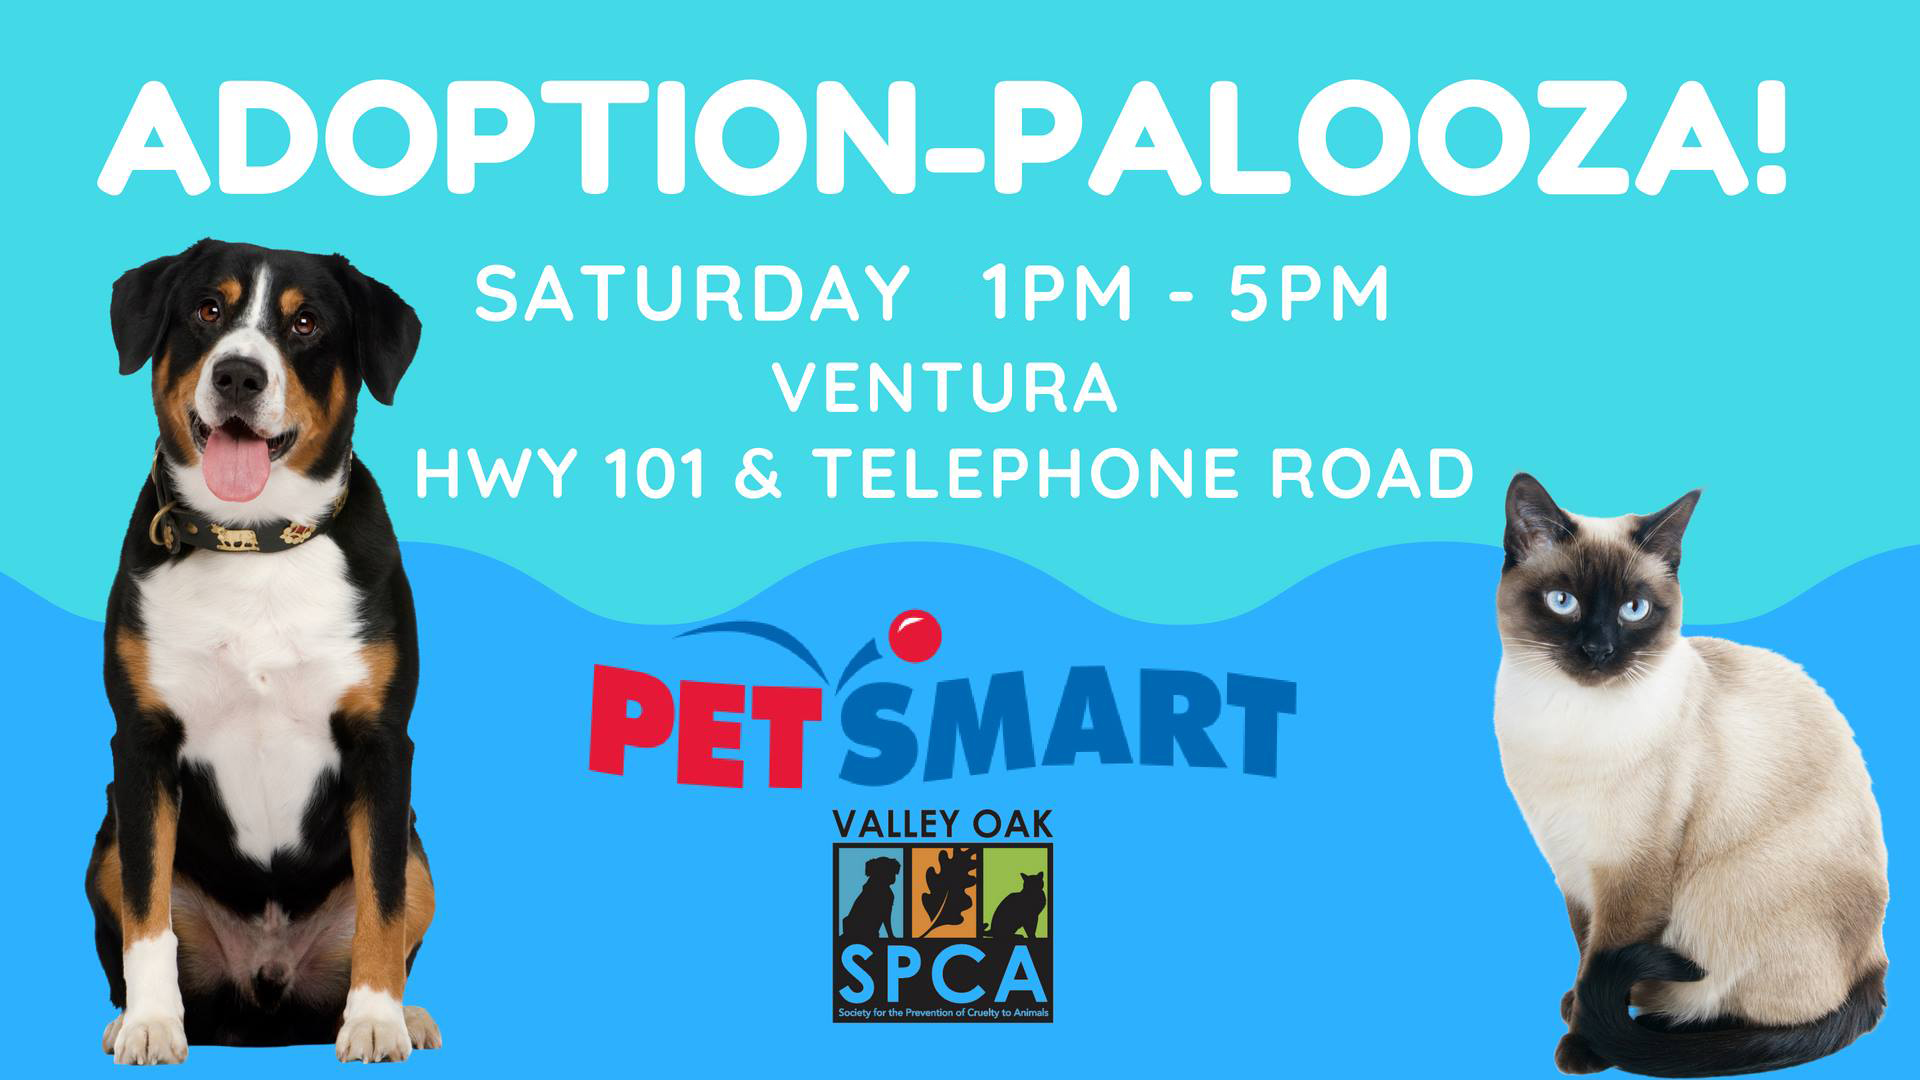 Ventura Adoption.jpg